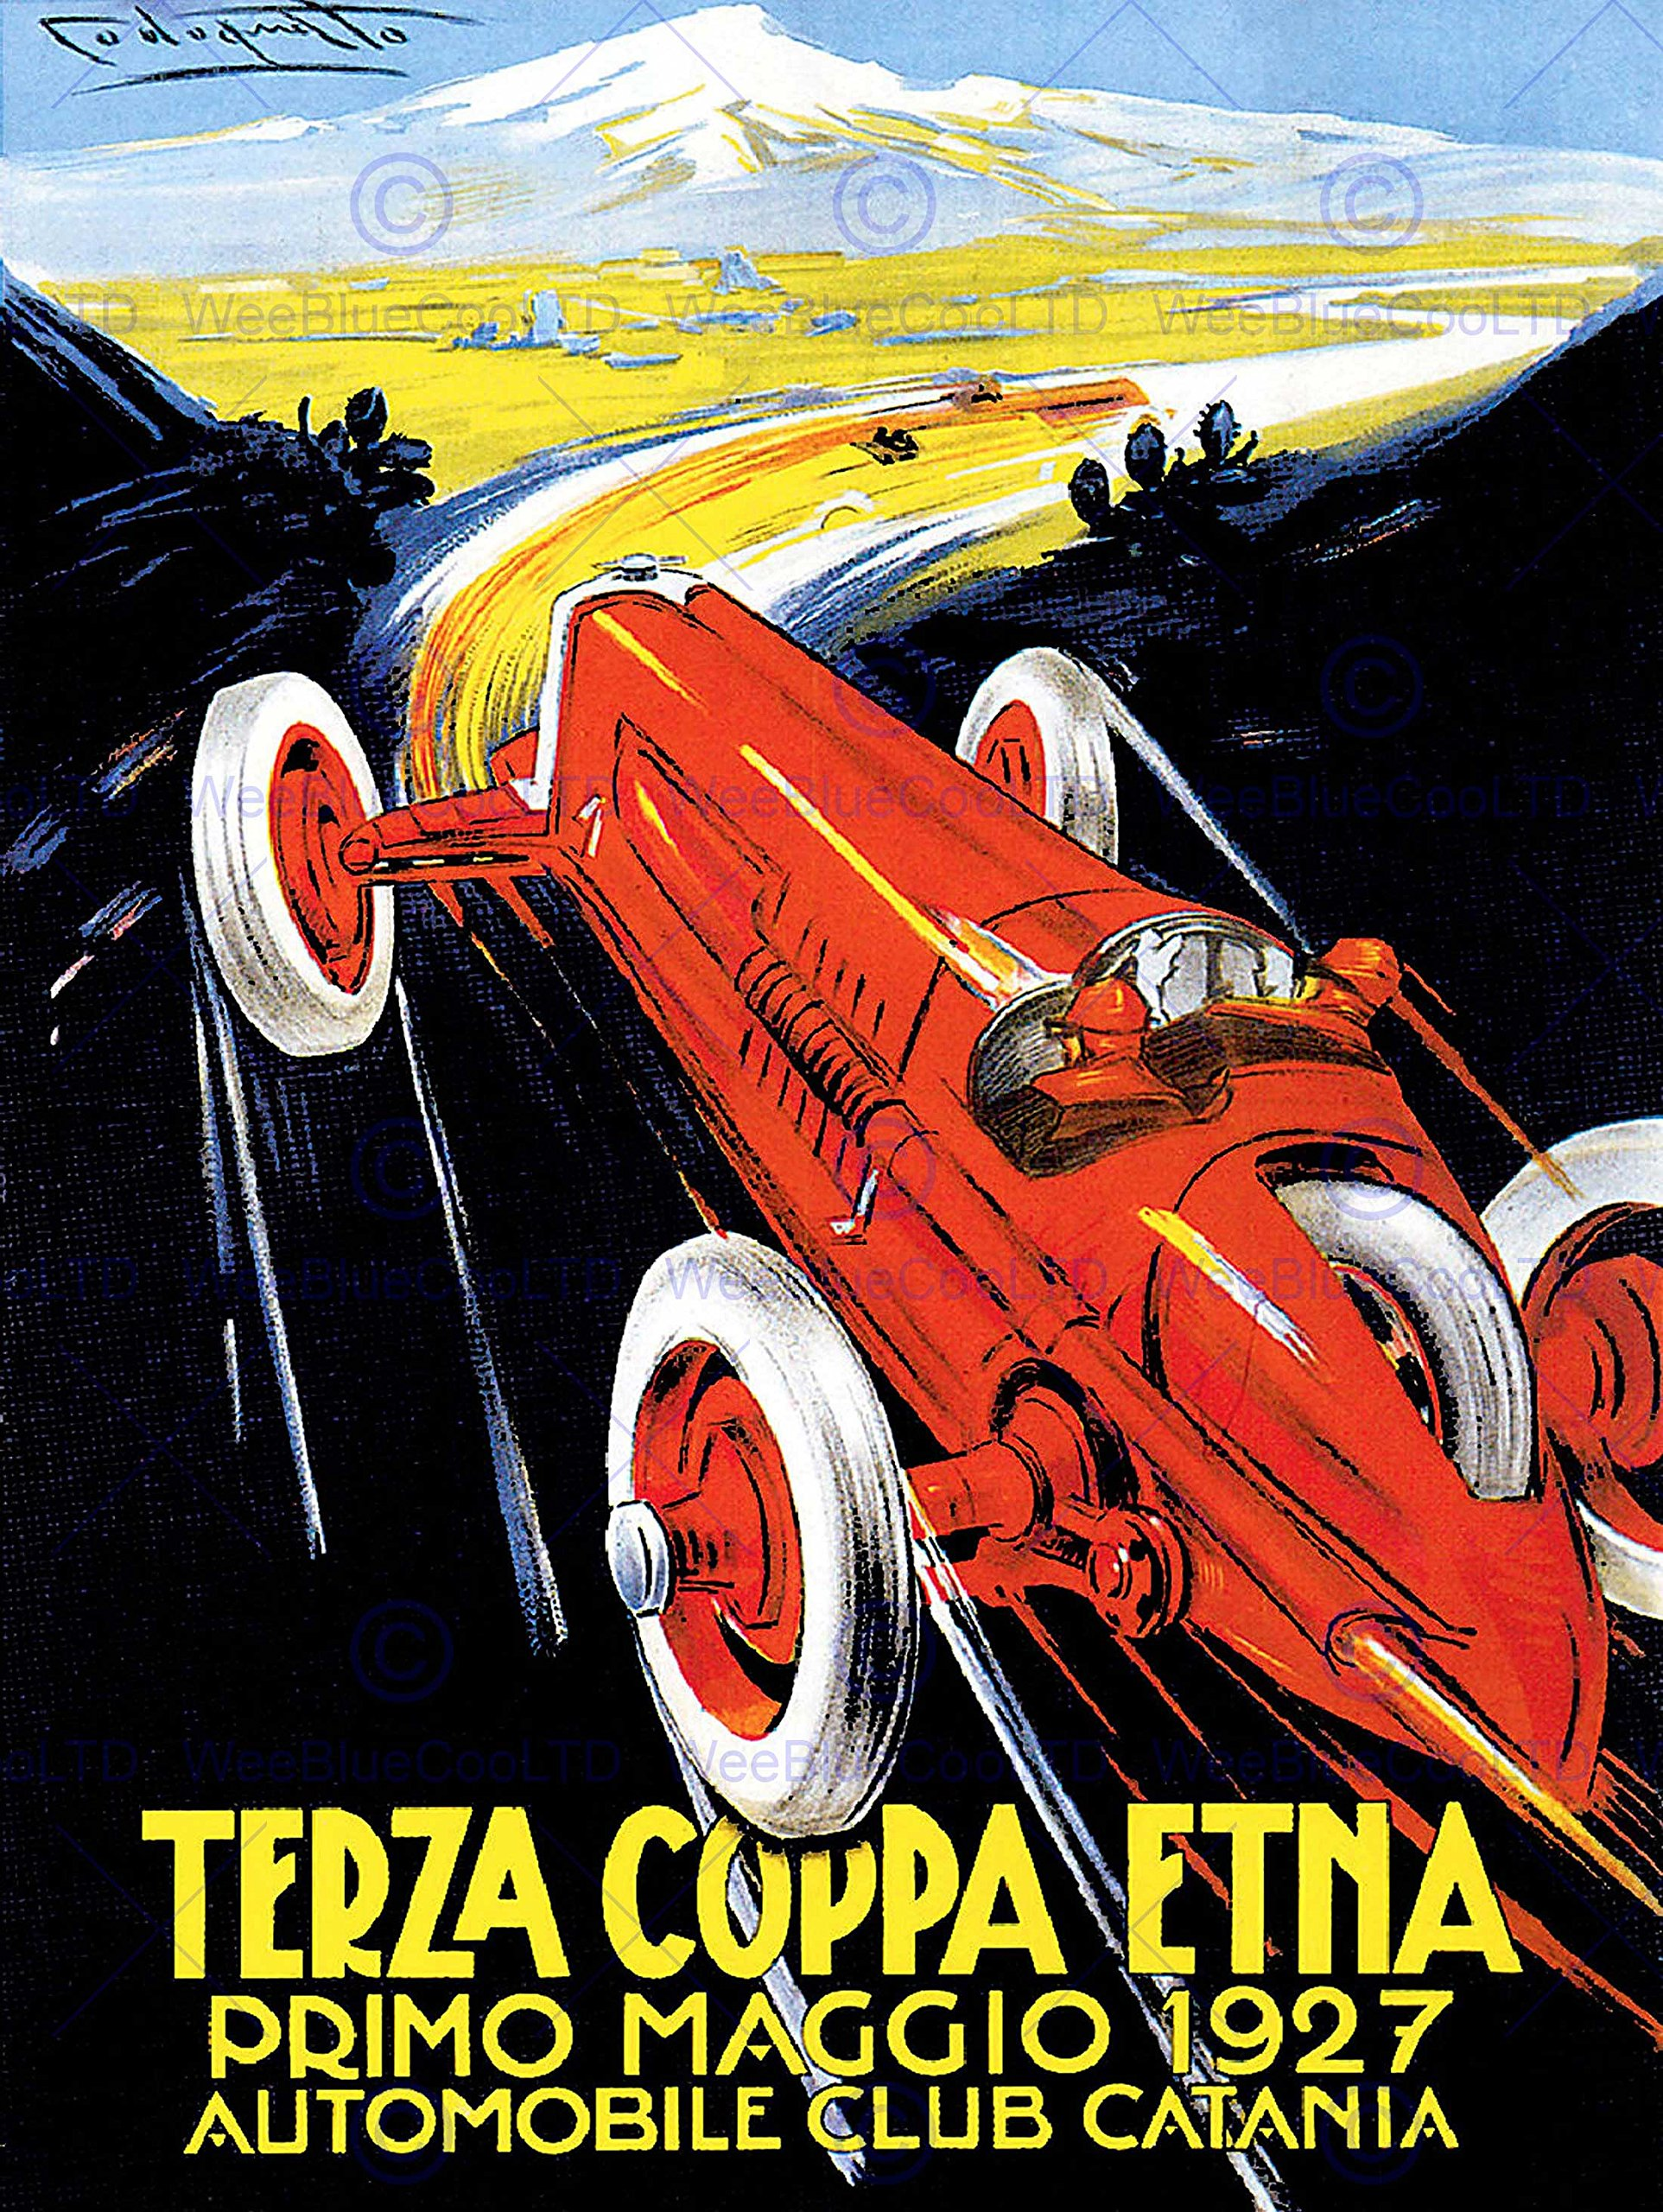 EXHIBITION SPORT MOTOR RACING CATANIA ITALY ETNA VINTAGE POSTER ART PRINT 12x16 inch 30x40cm 856PY